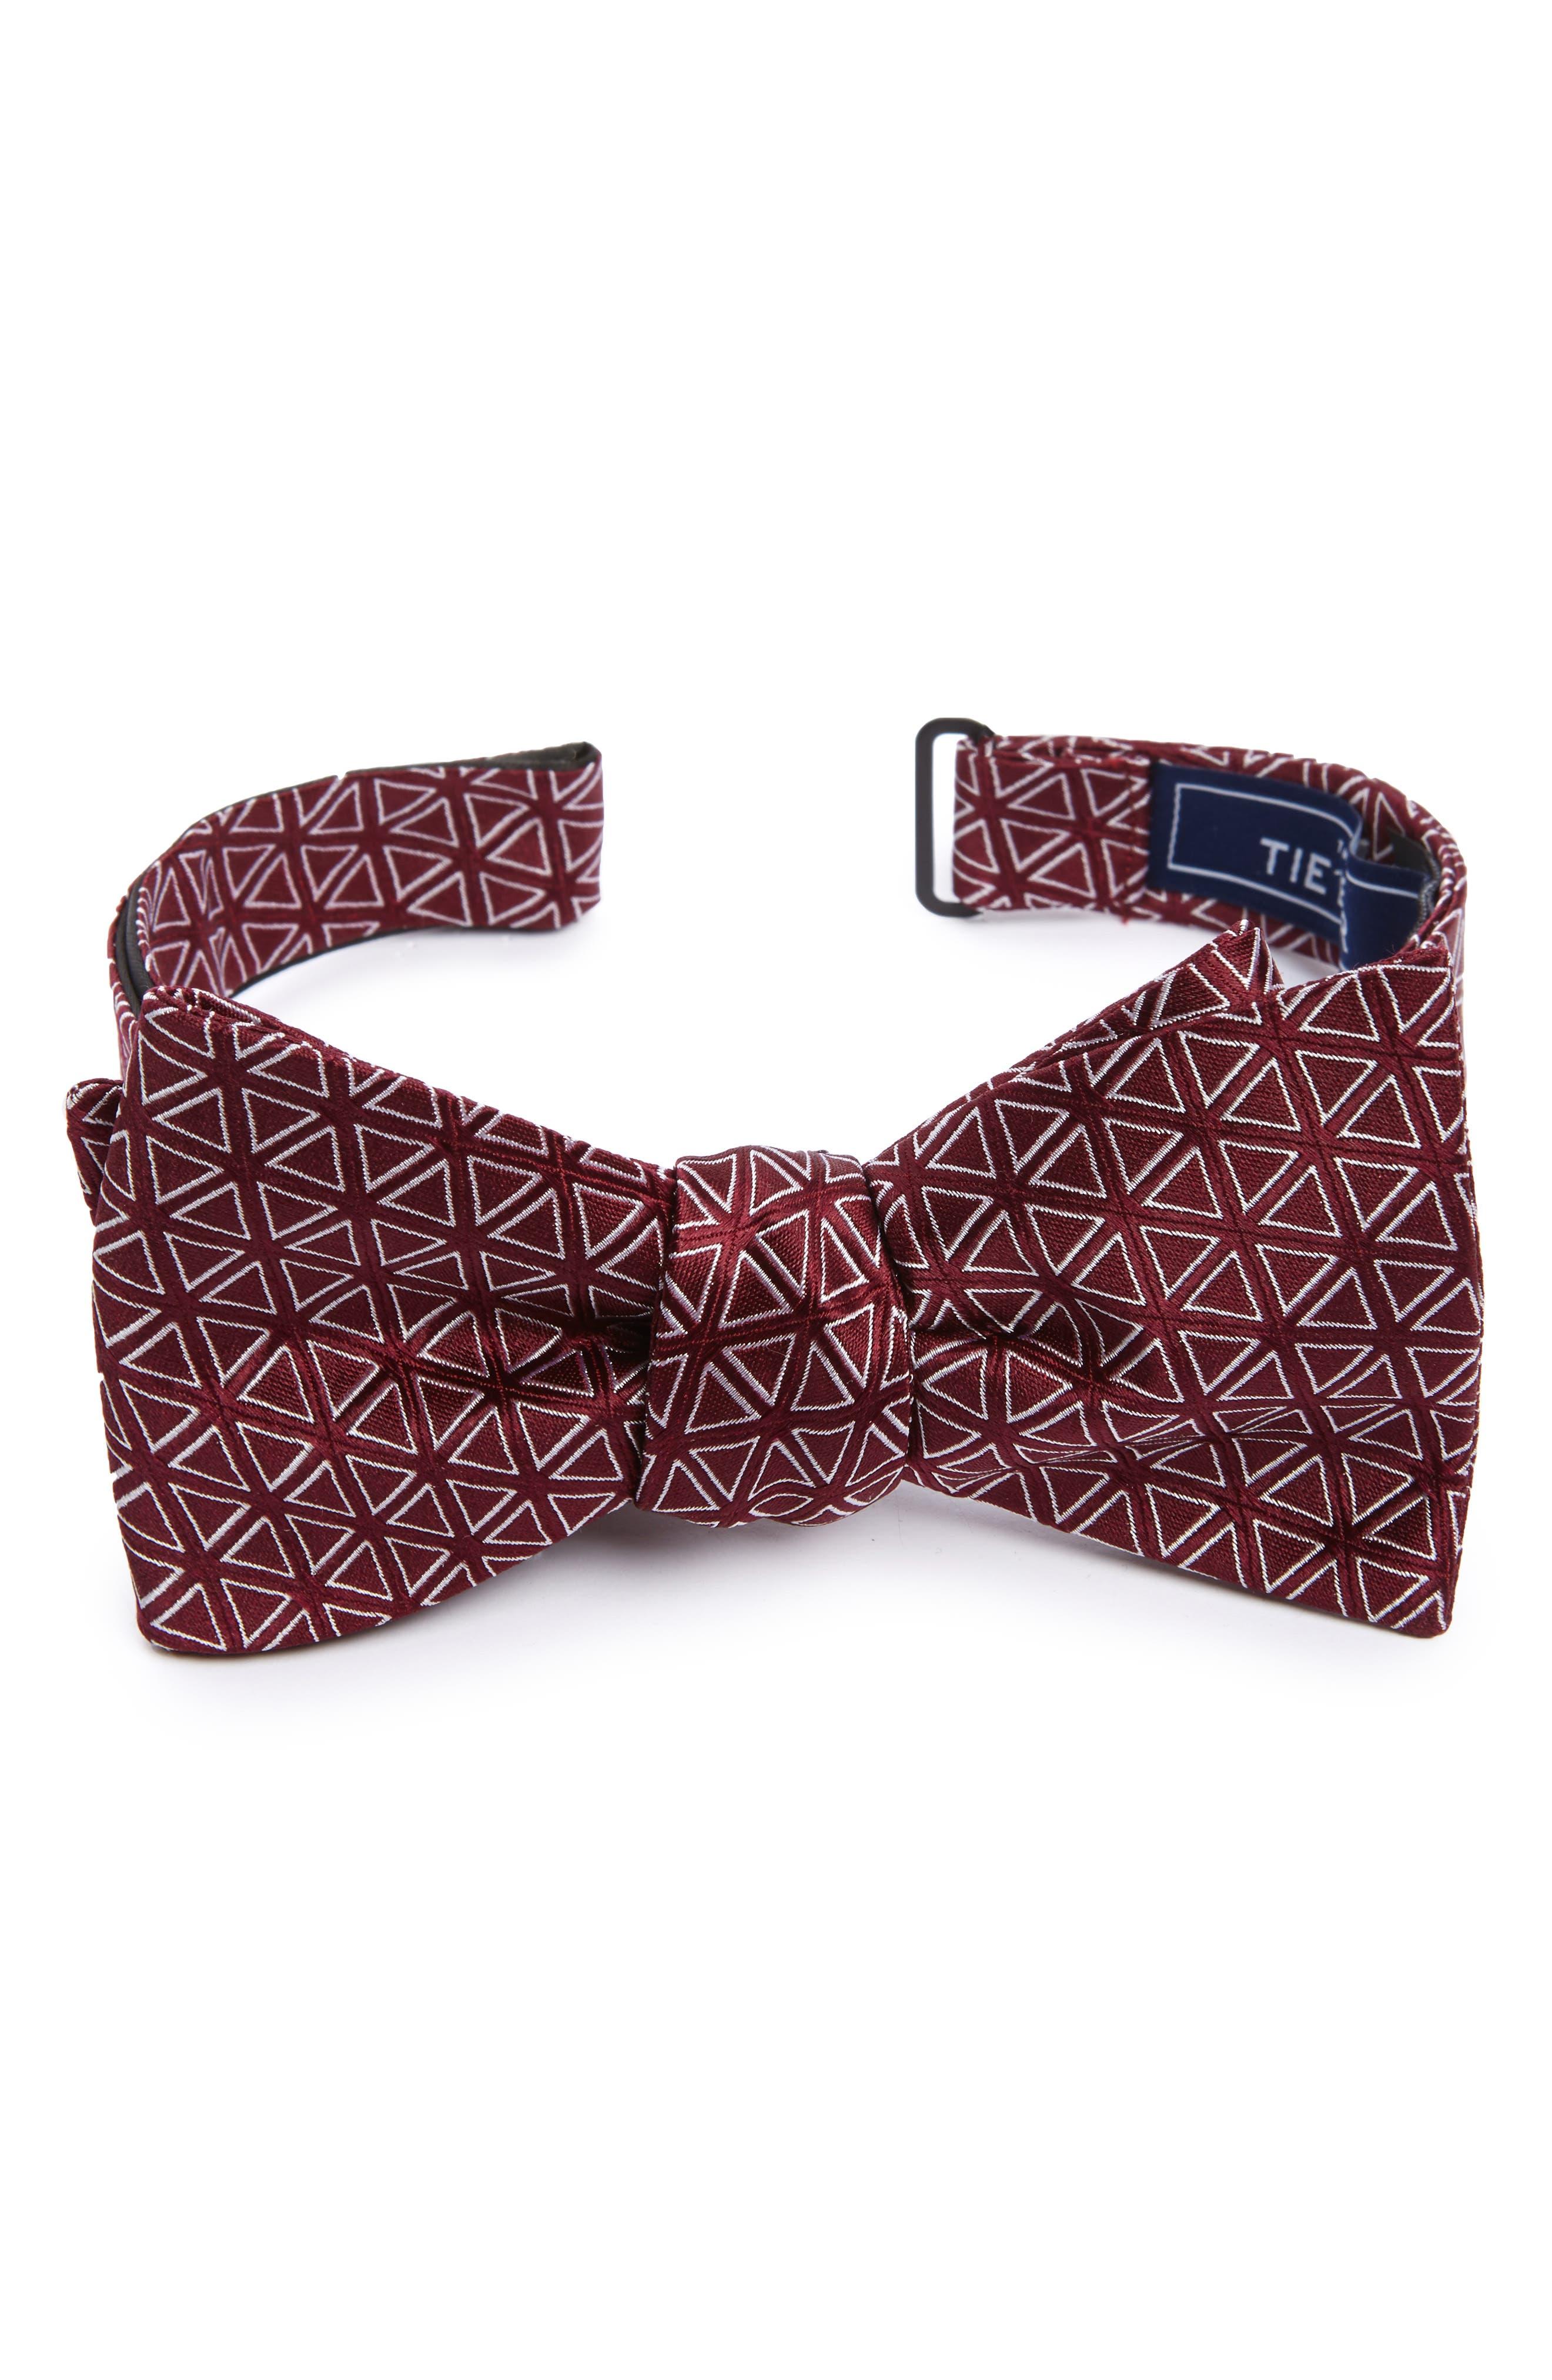 The Tie Bar Triad Silk Bow Tie